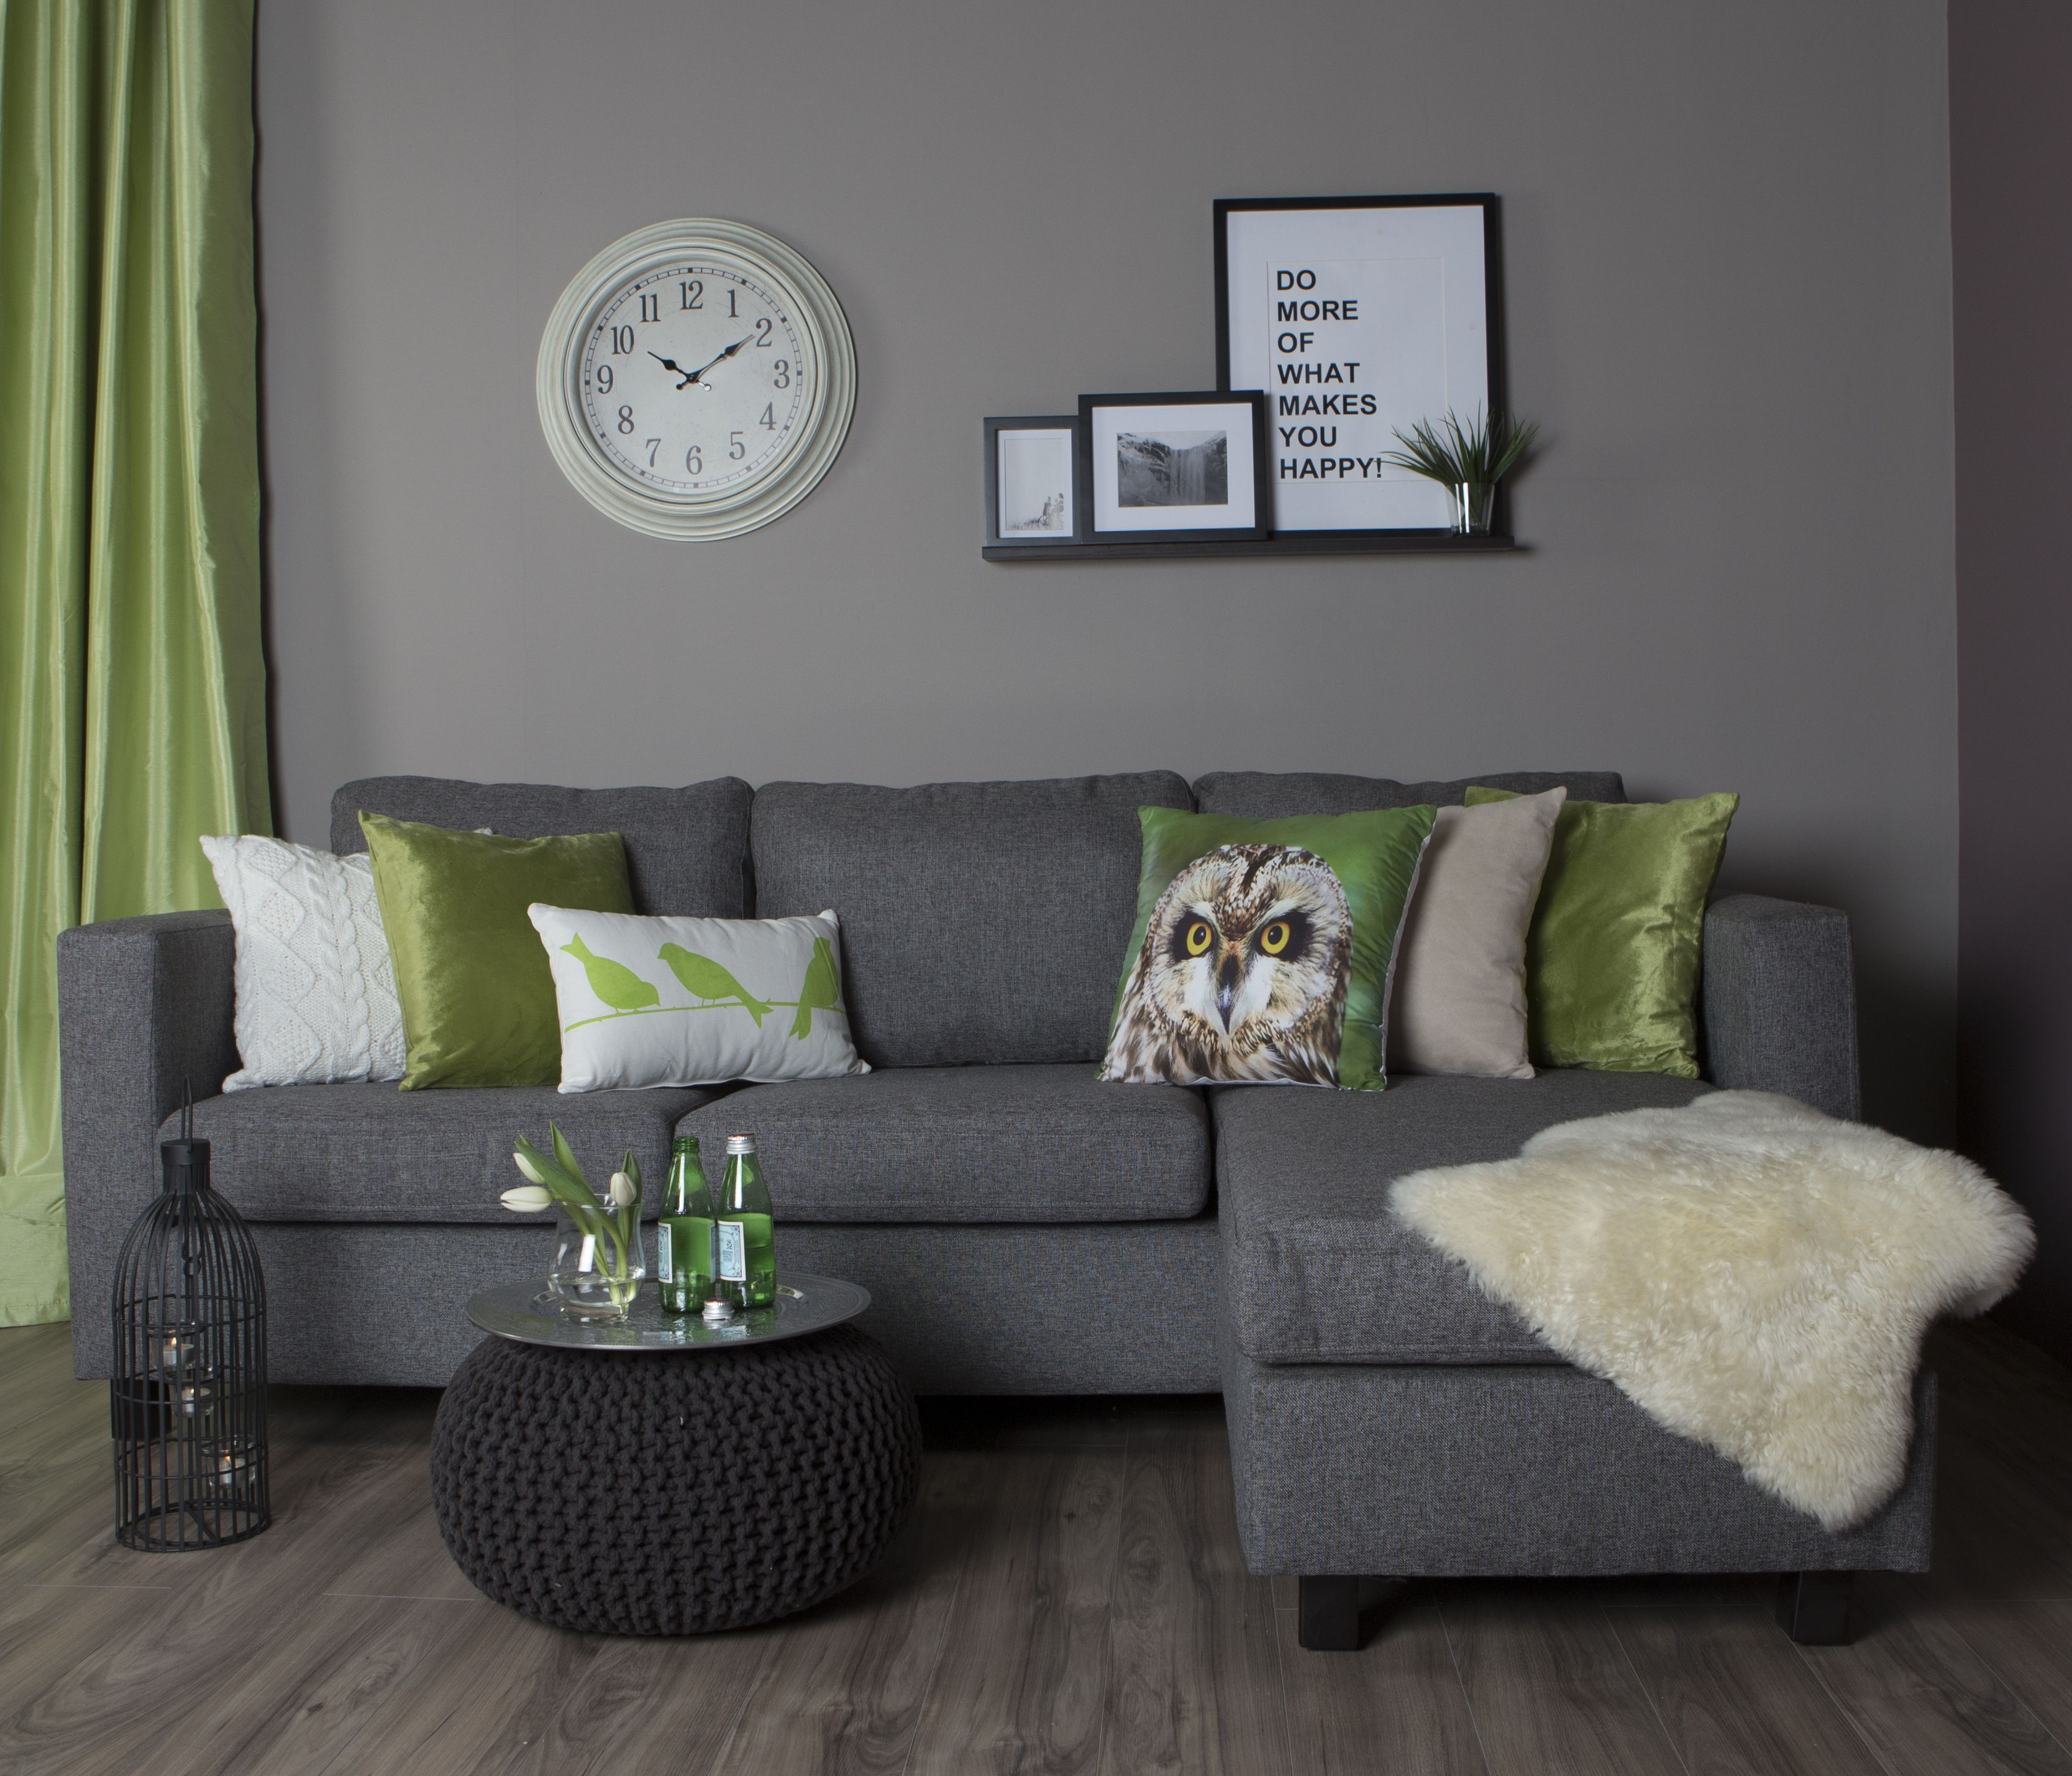 Pouf Used As A Sofa Table Home Decor Living Room Carpet Living Room Grey